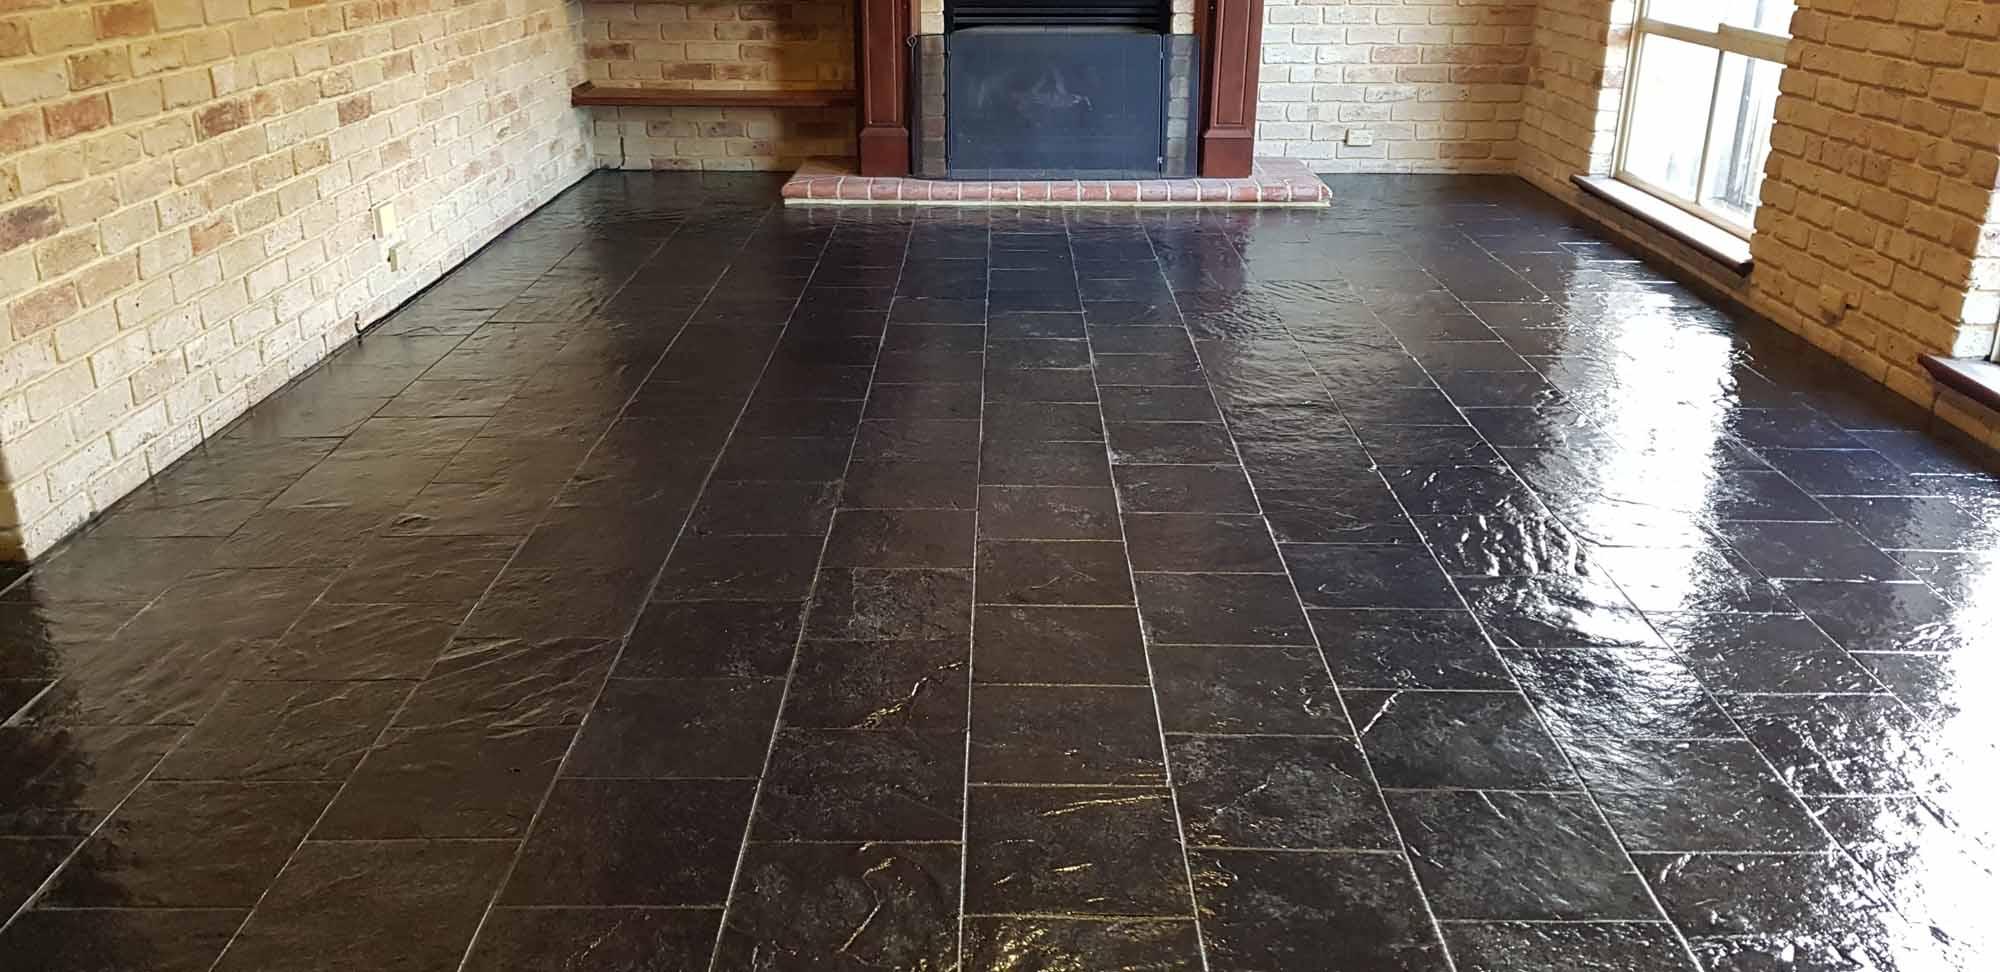 Slate Tile Cleaning & Sealing Perth WA